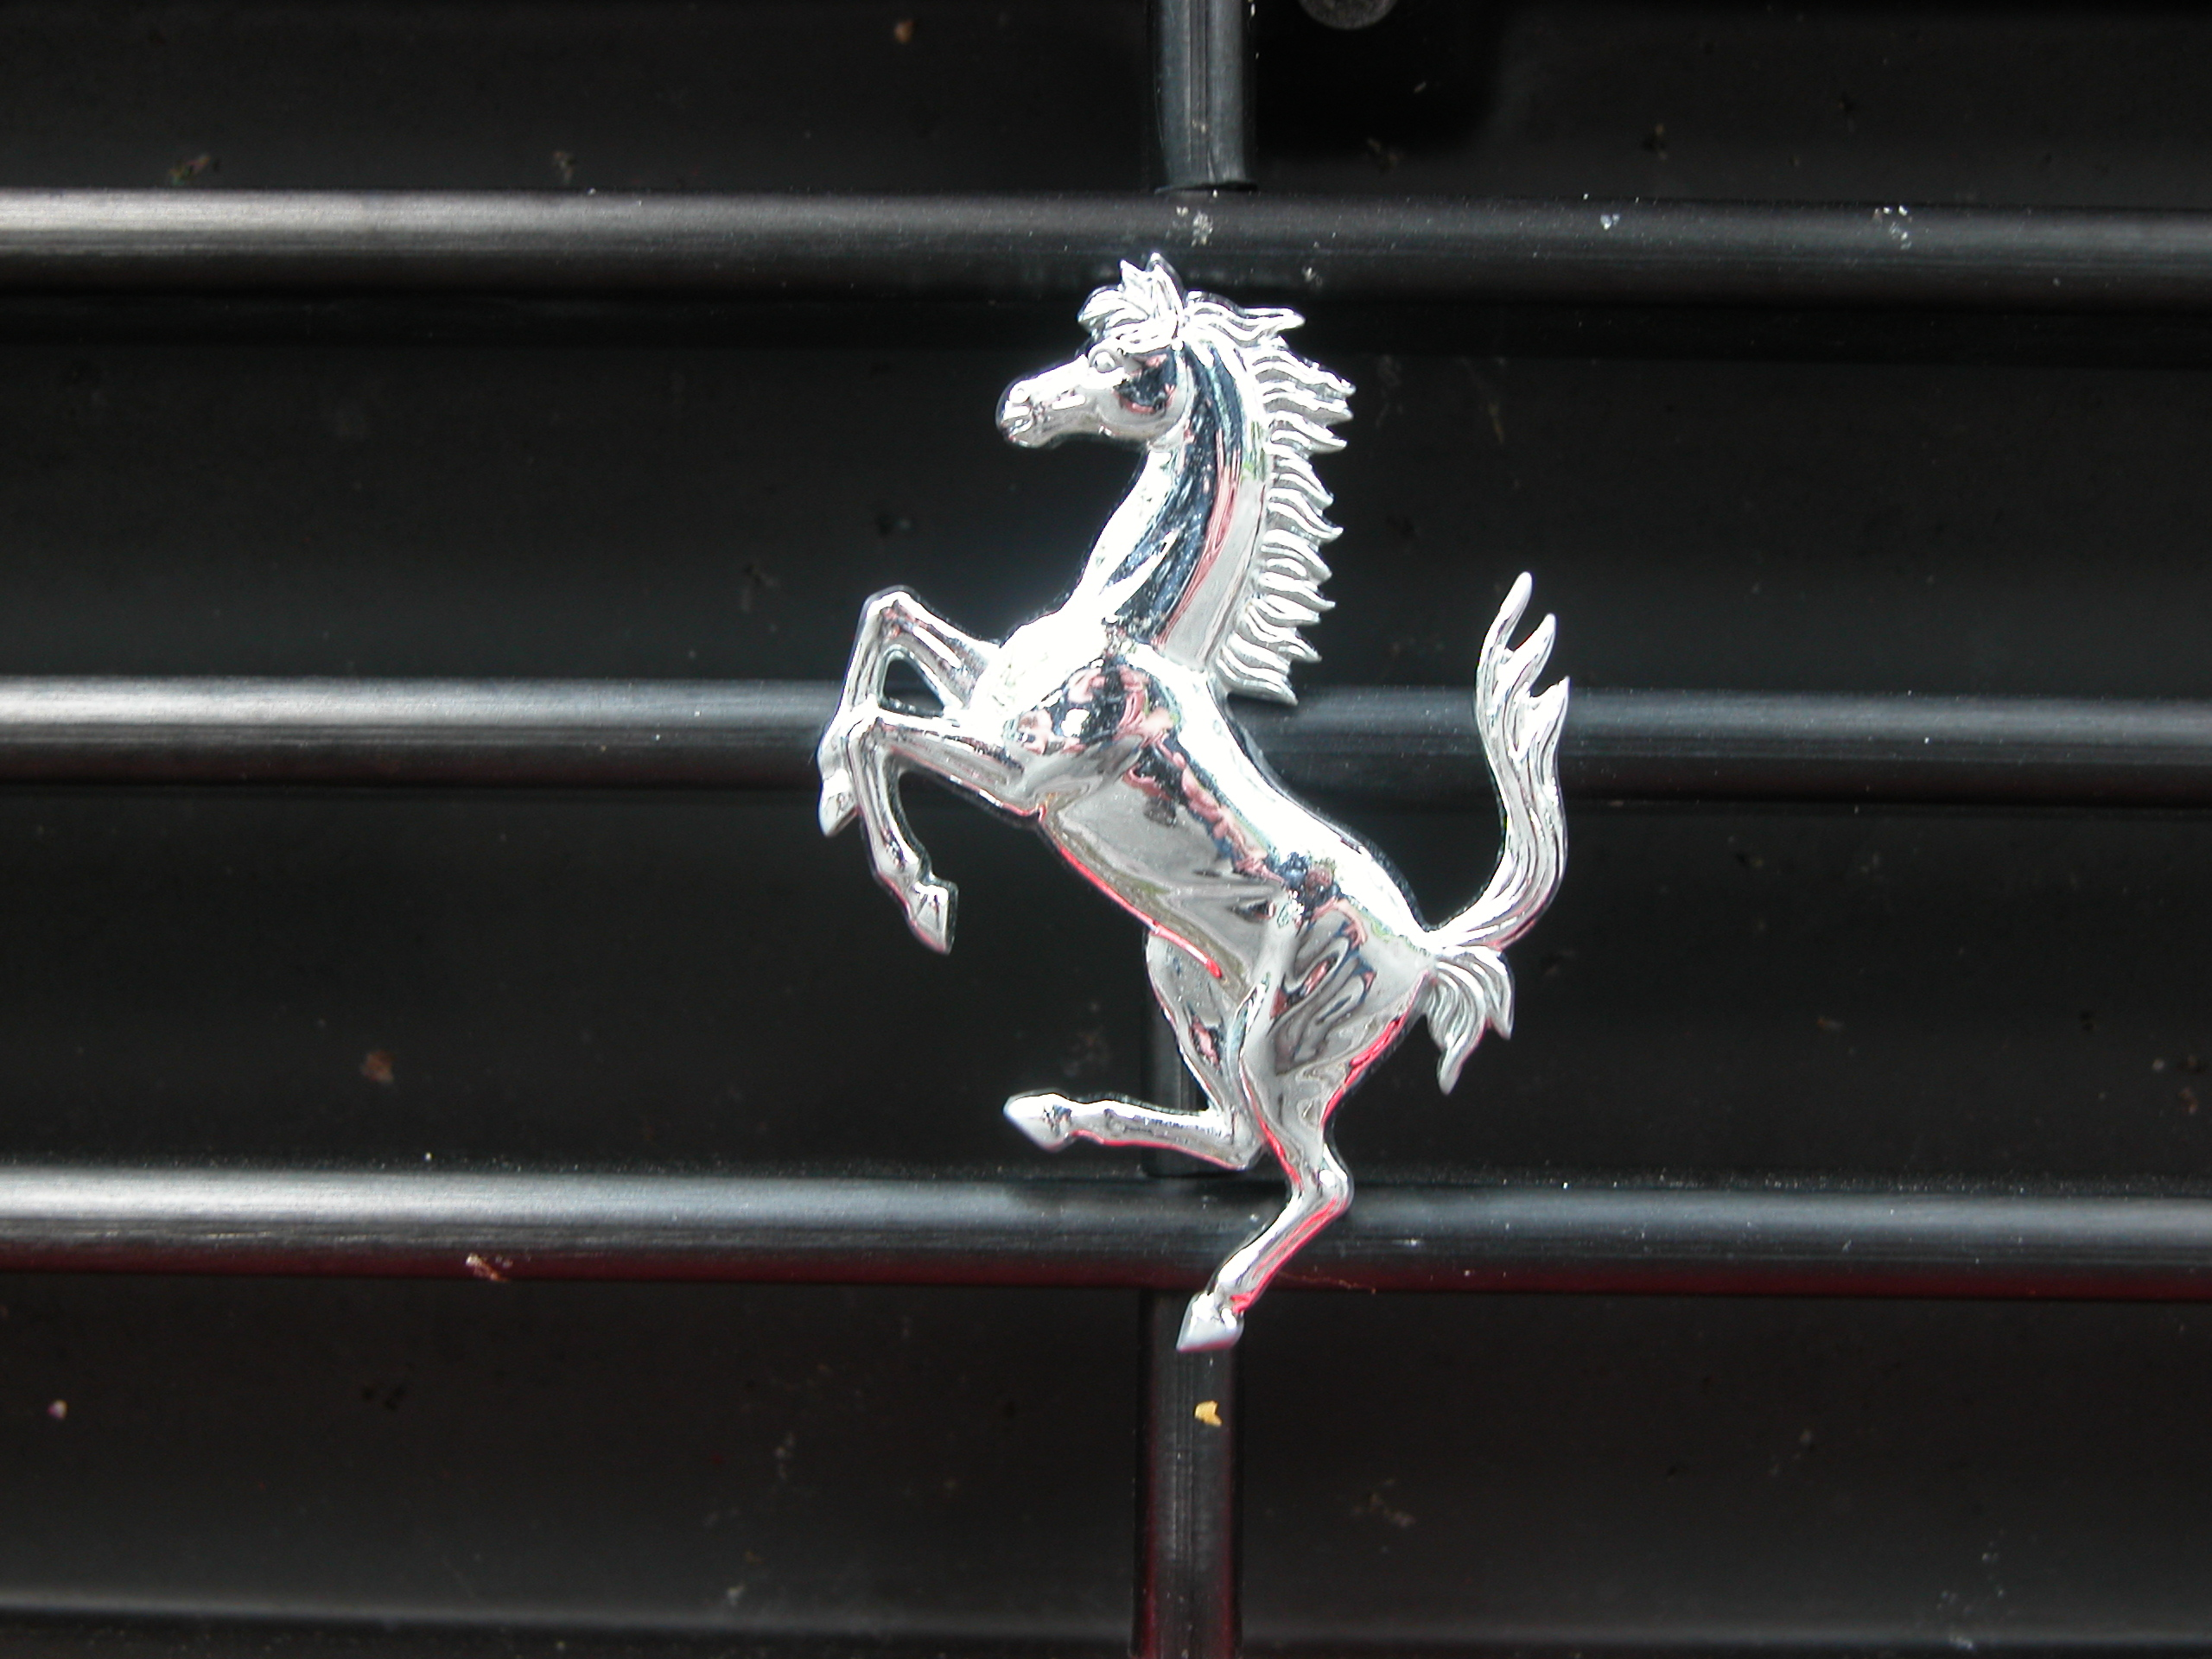 signs objects brand logo ferrari horse chrome